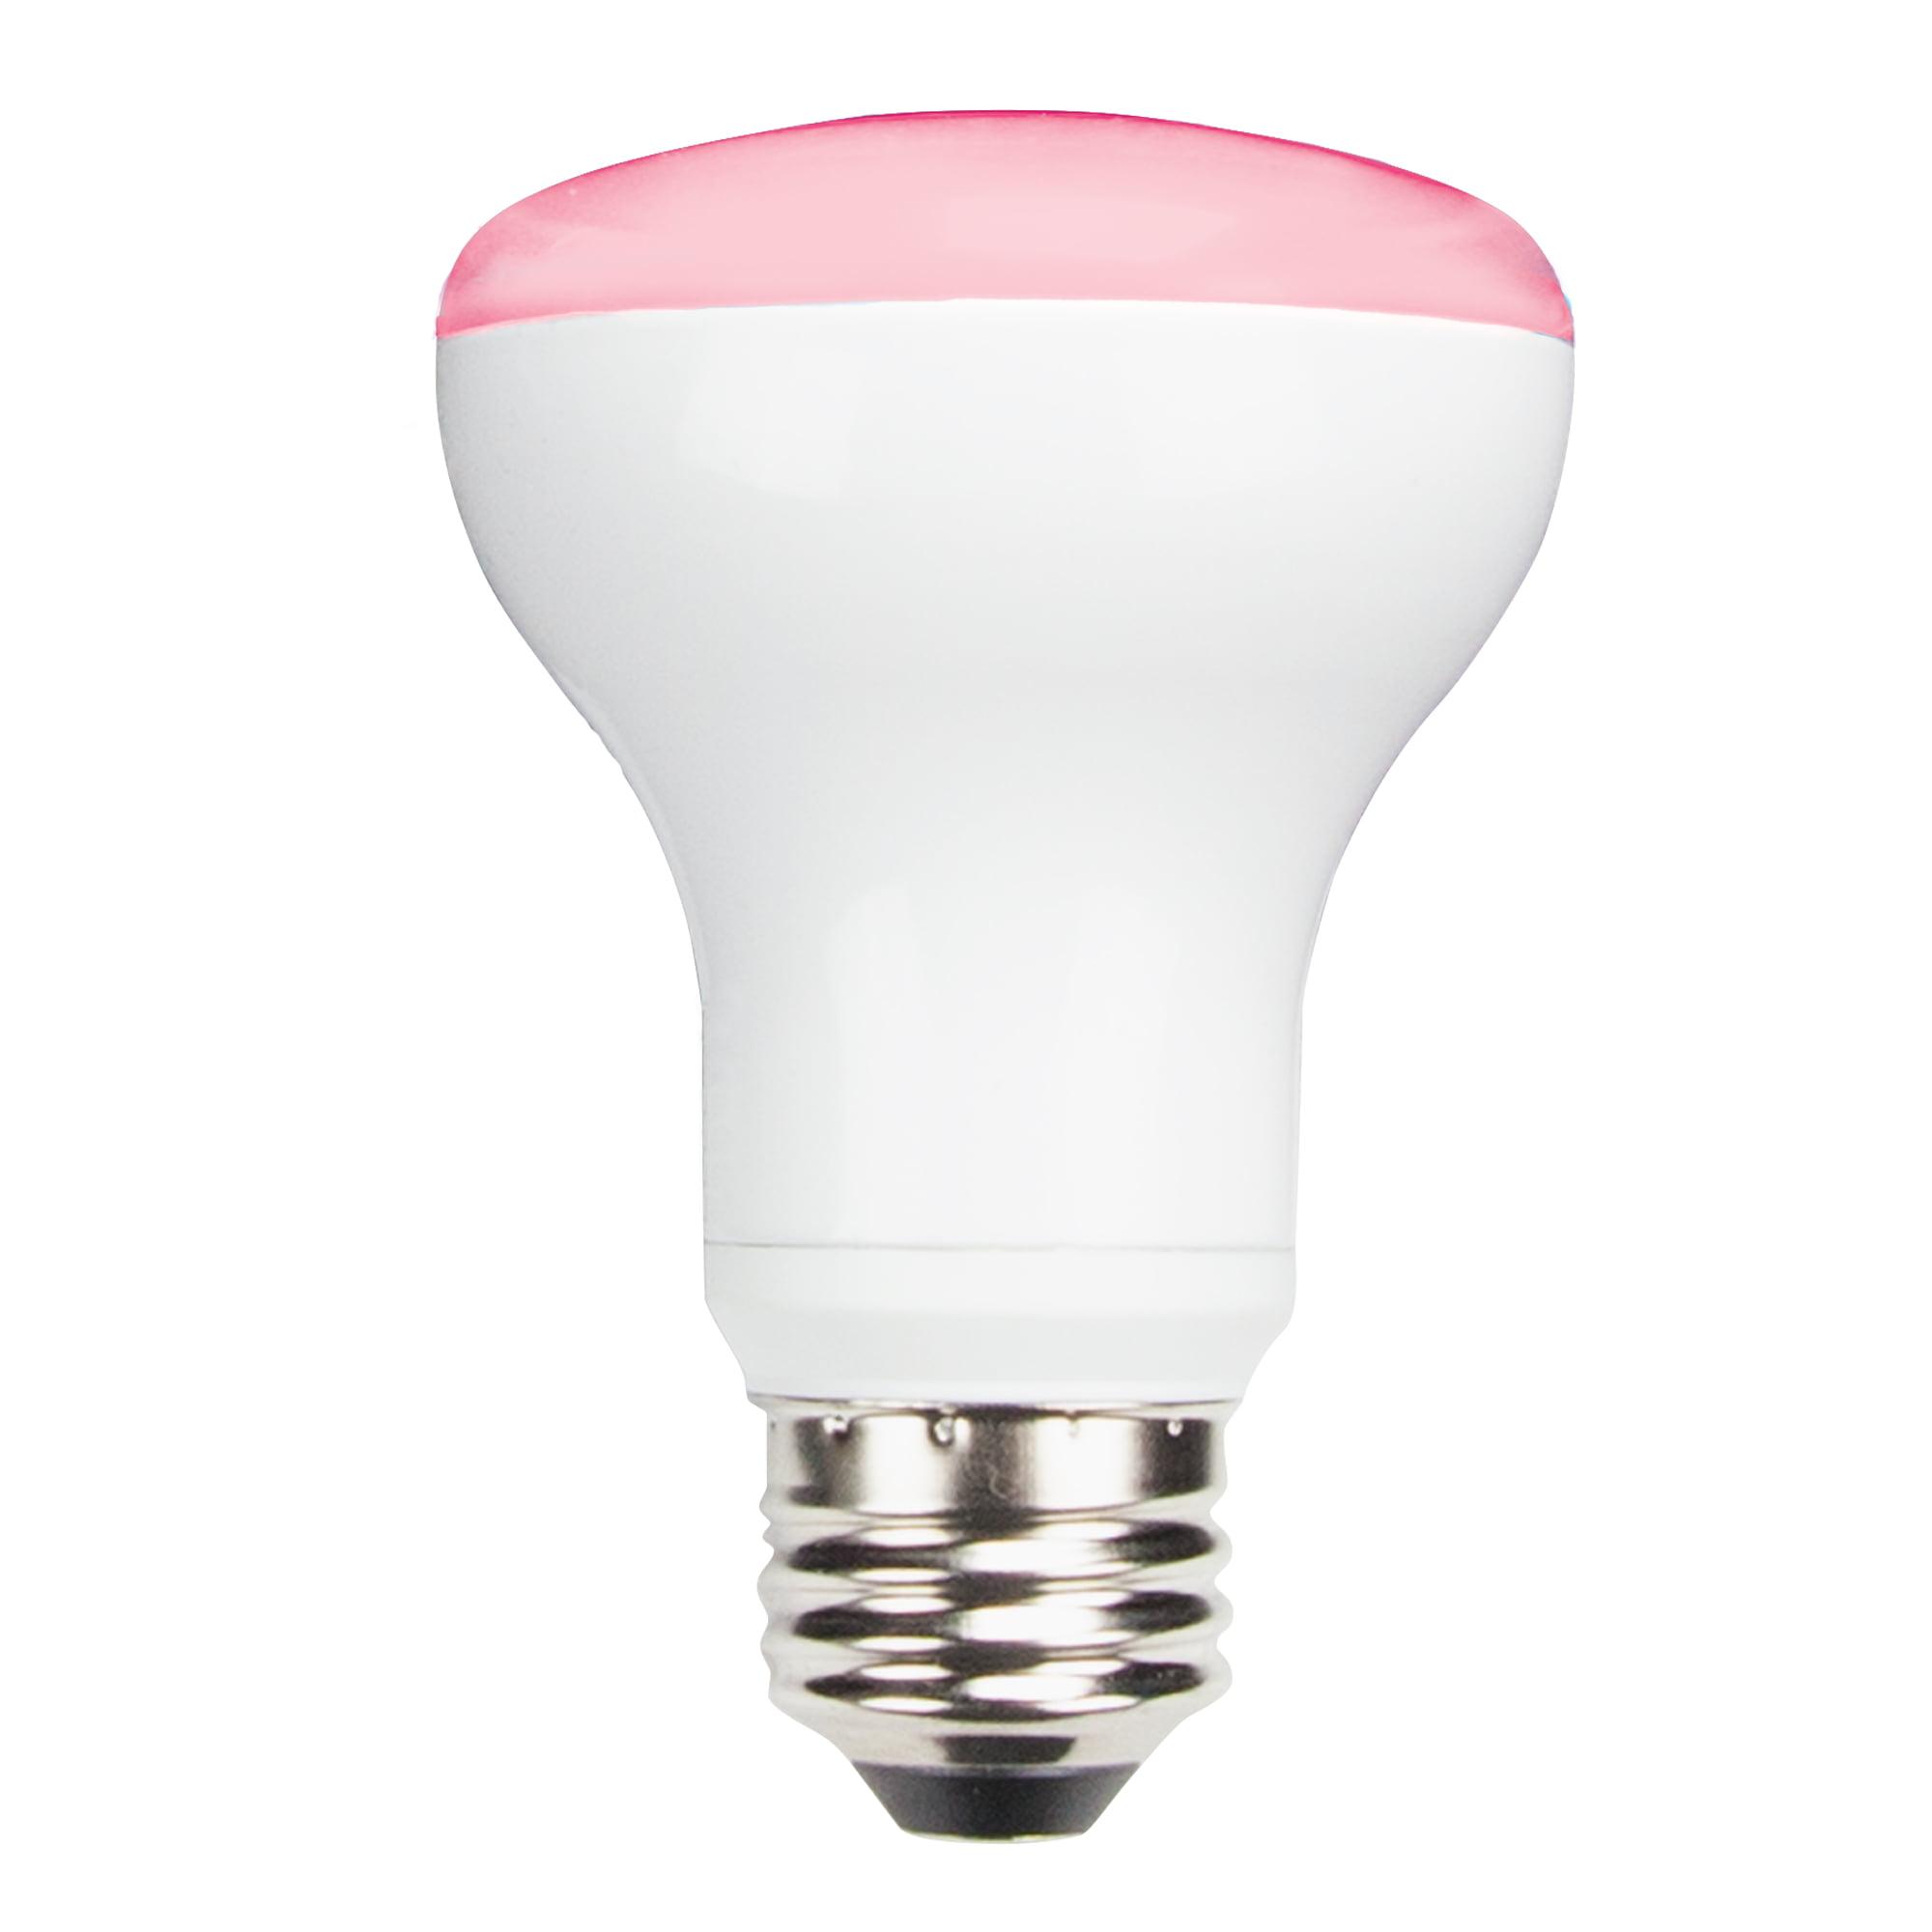 BSY 156RK 1 Pcs Lamp Replacement Led JPR20//120V50W//NFL Bulb for Light Bulb 7 Watt 120 Volt